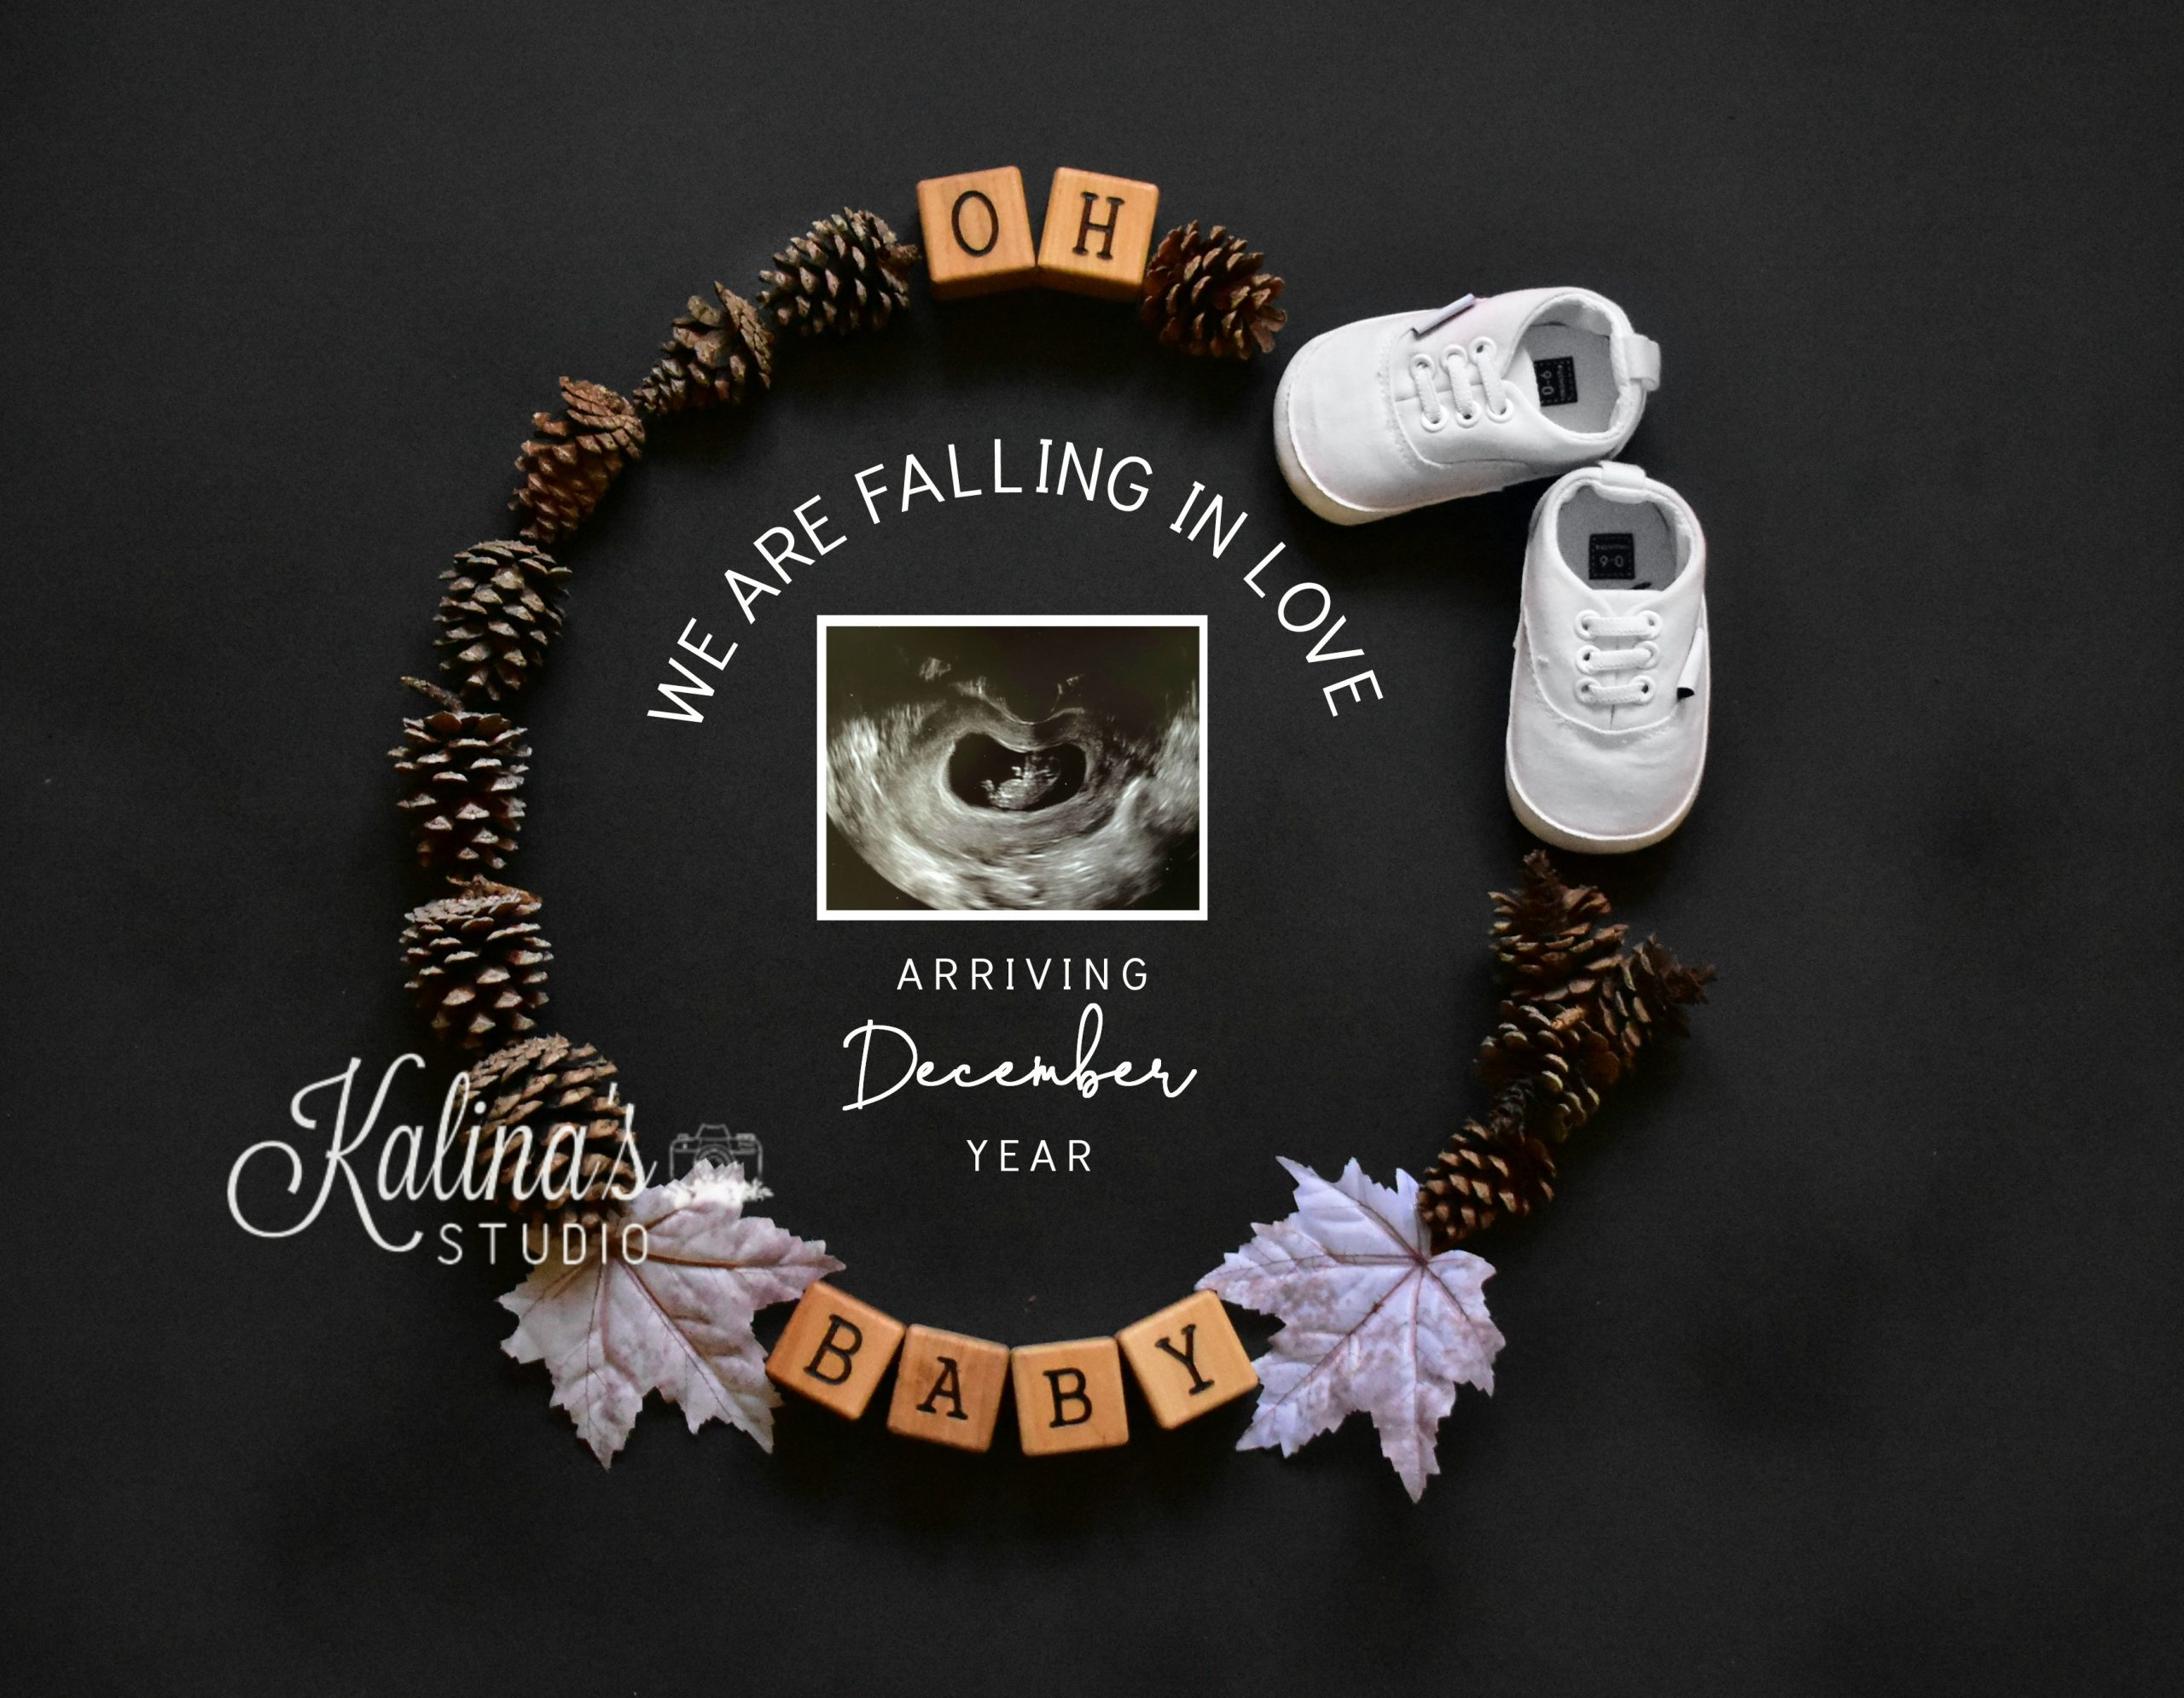 PregnancyAnnouncementBabyannouncementsocialmedia